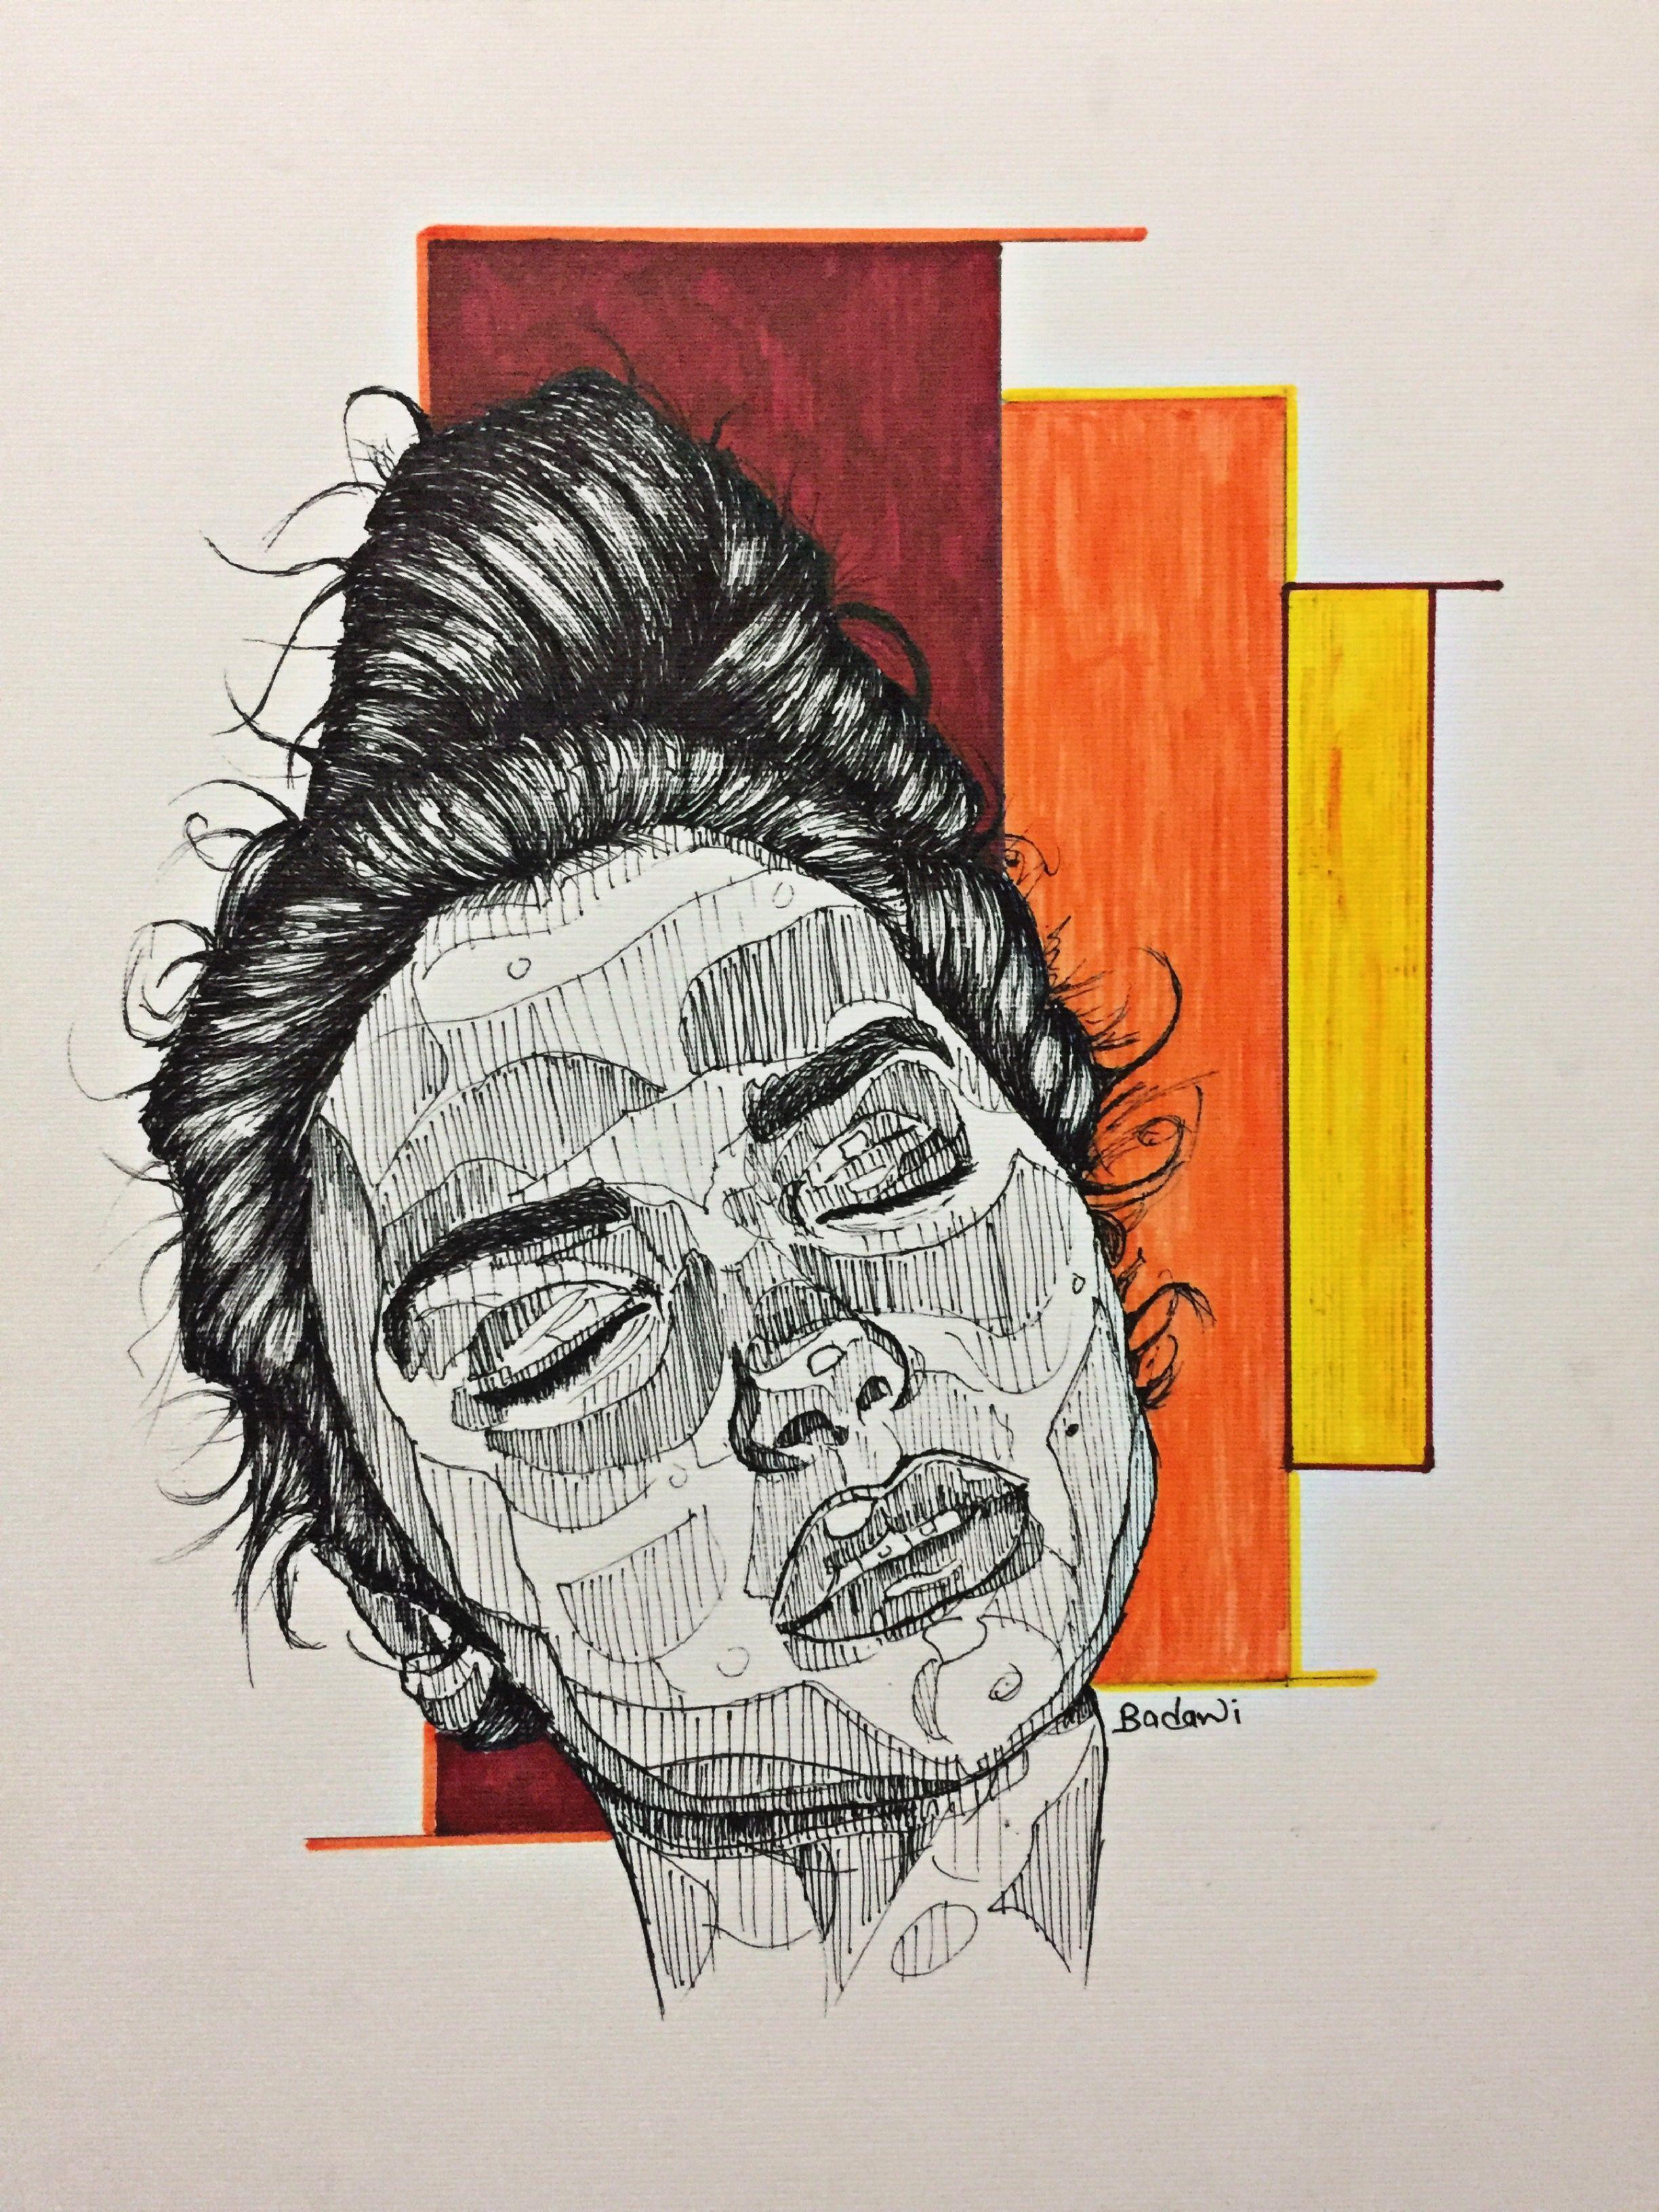 Pin Uzivatele Brekeil S Na Nastence Art Pinterest Kresby A Ilustrace